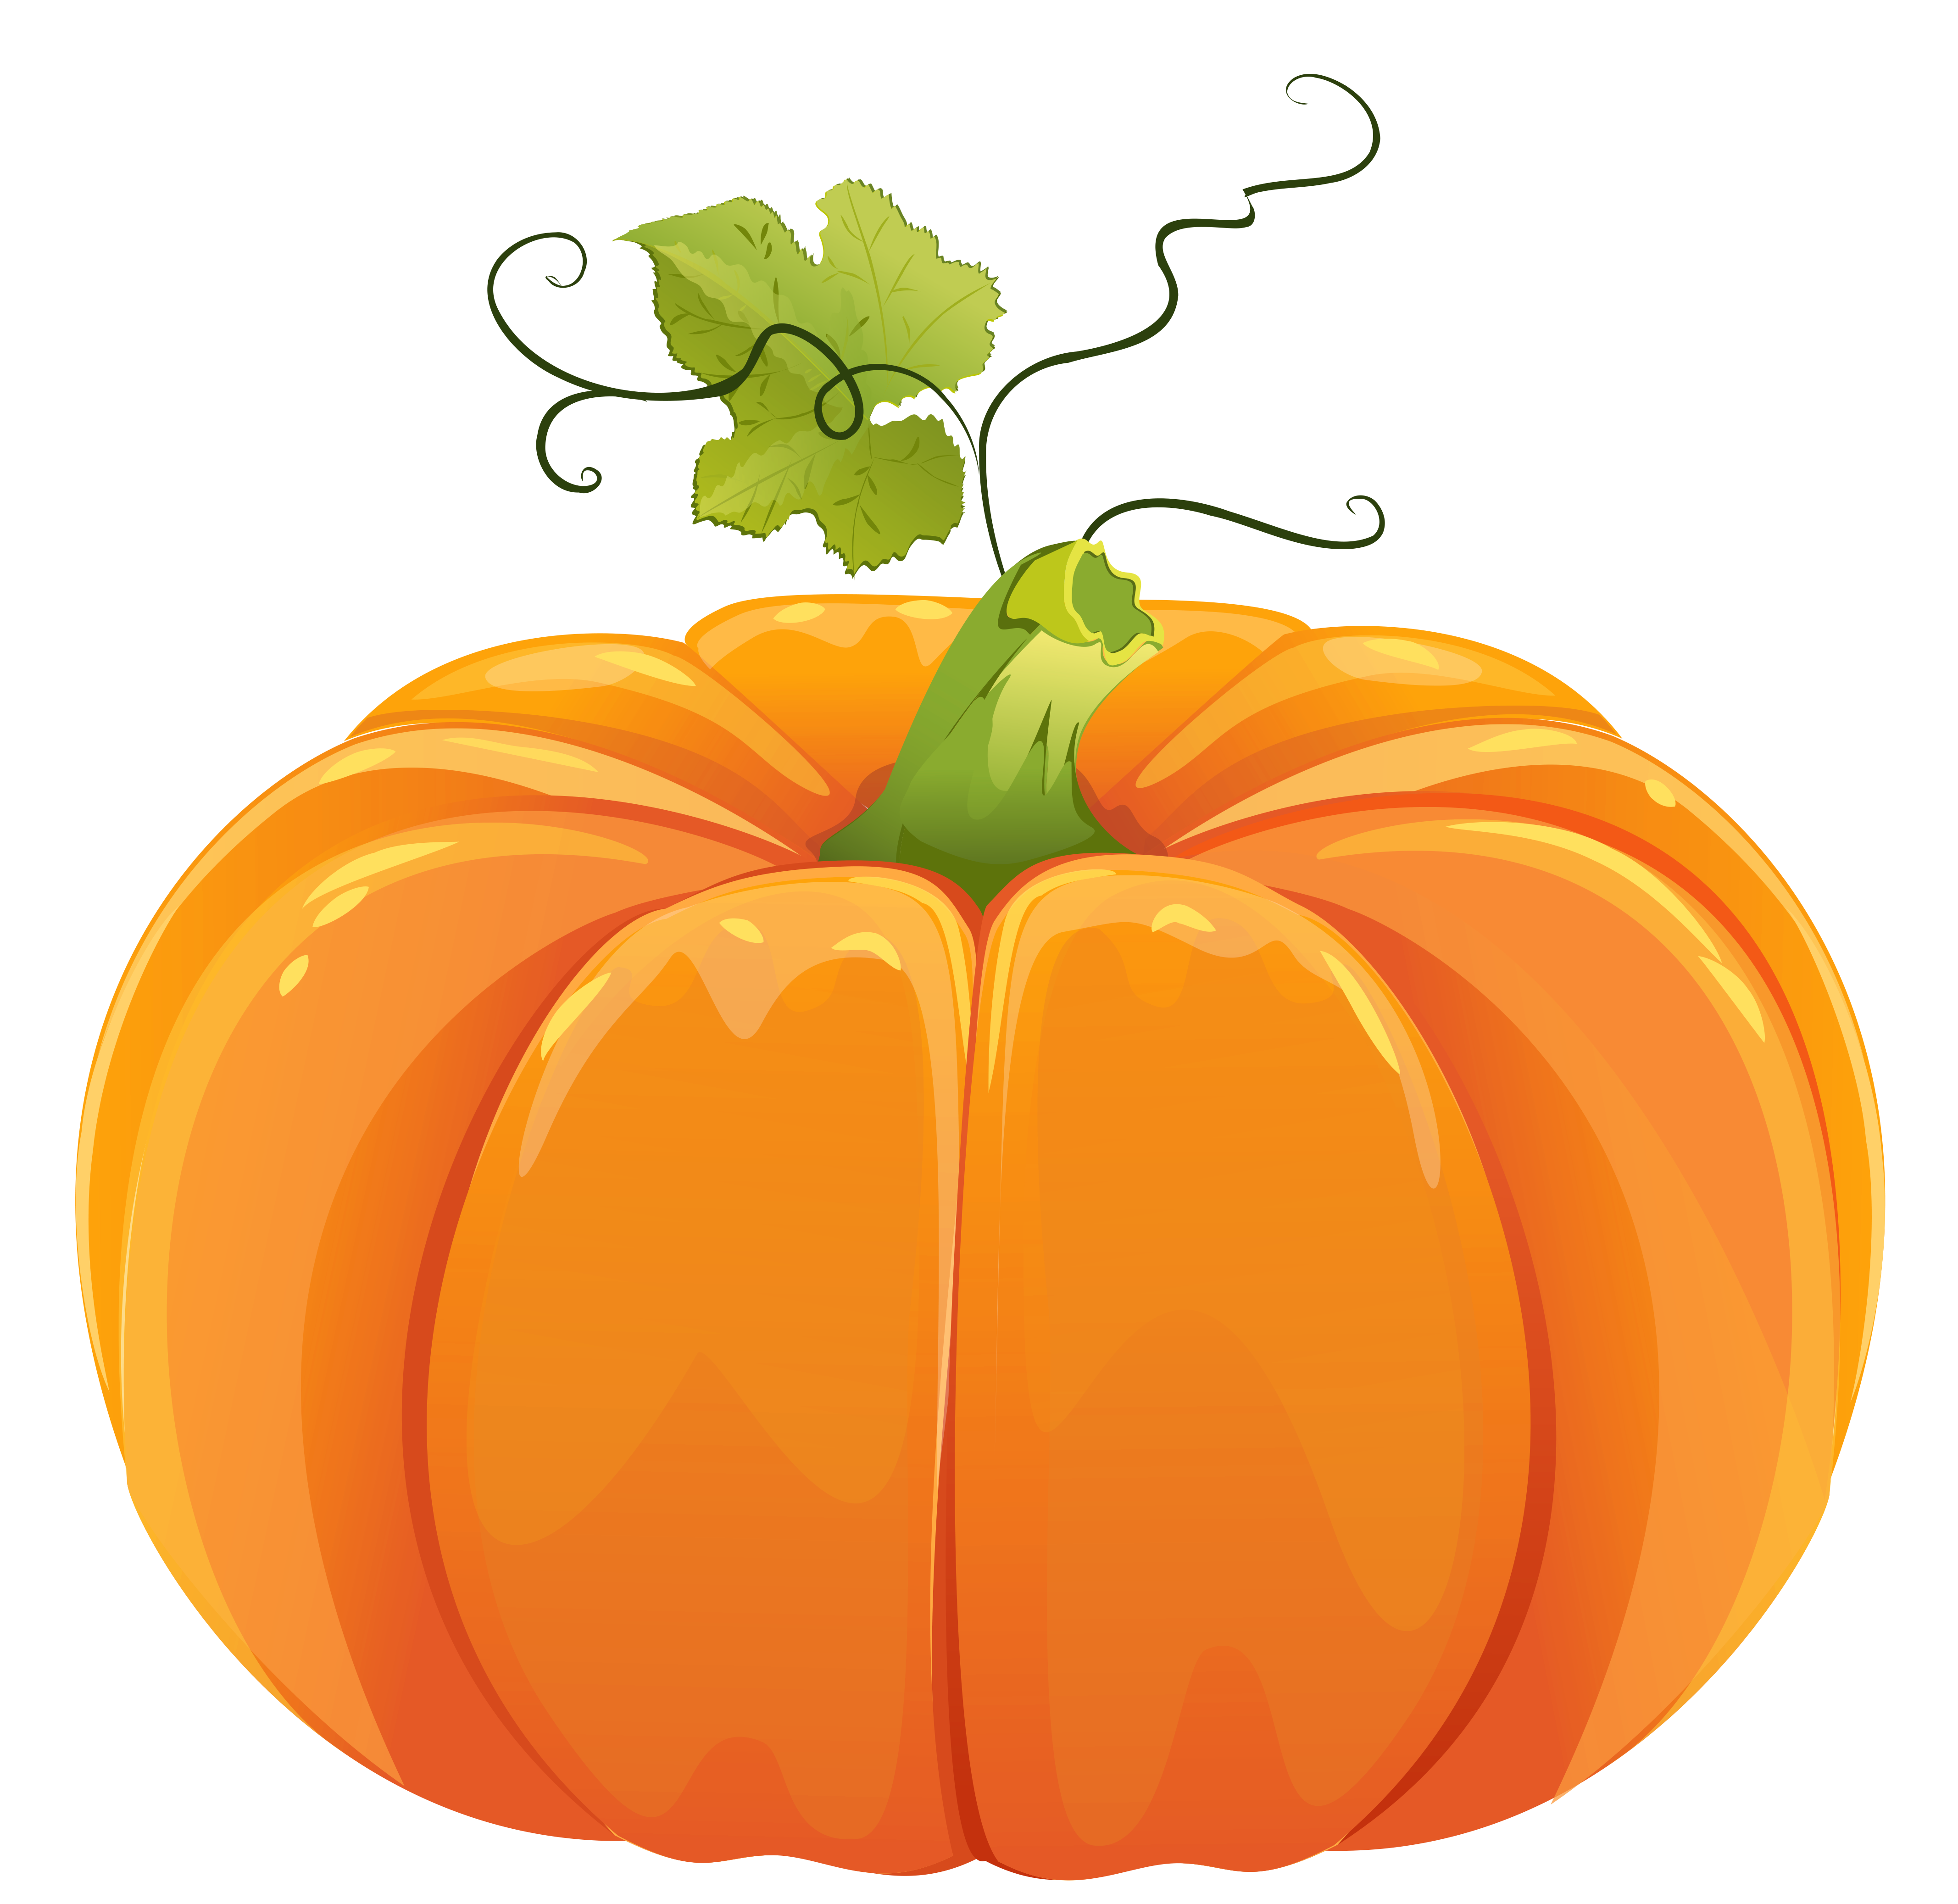 Free Clipart Pumpkins - clipartall-Free Clipart Pumpkins - clipartall-7